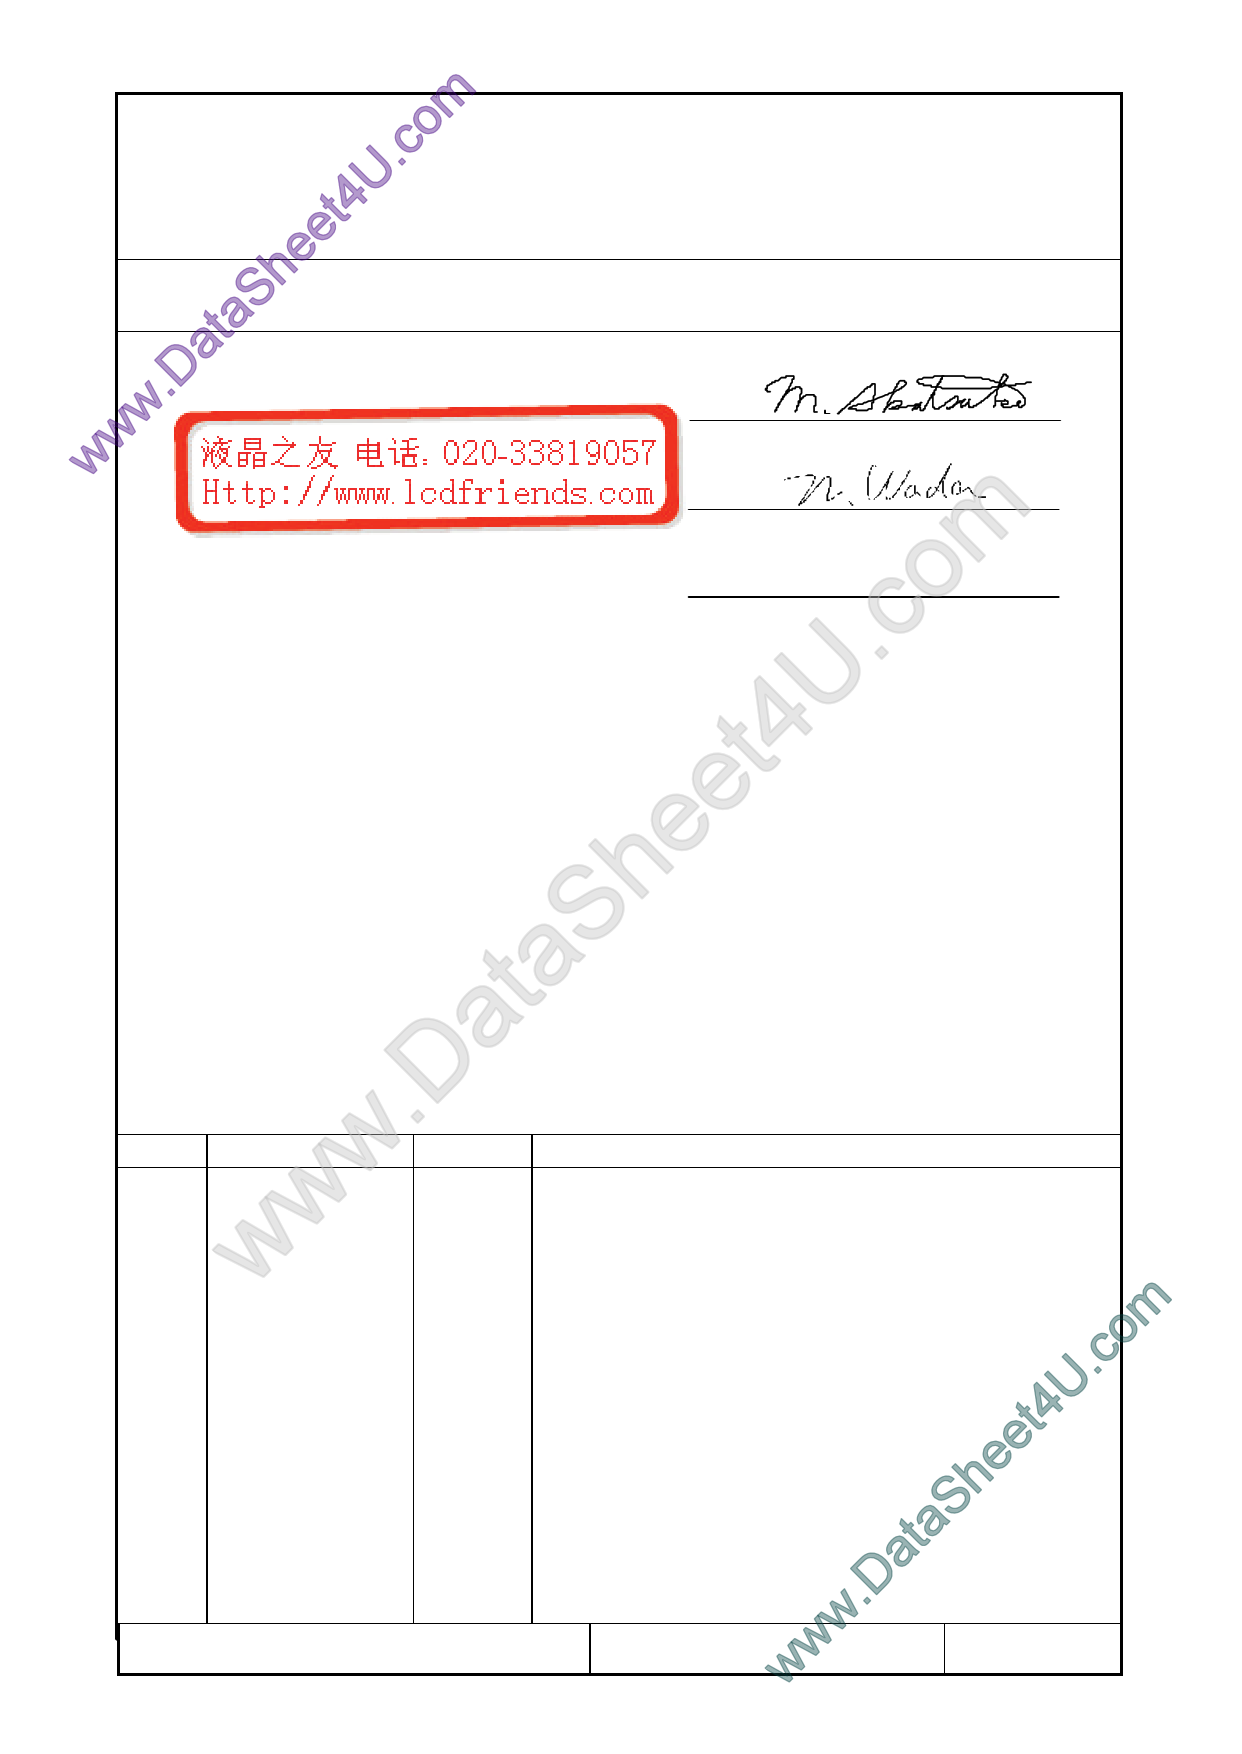 F-51852GNFQJ-LG-ACN Даташит, Описание, Даташиты